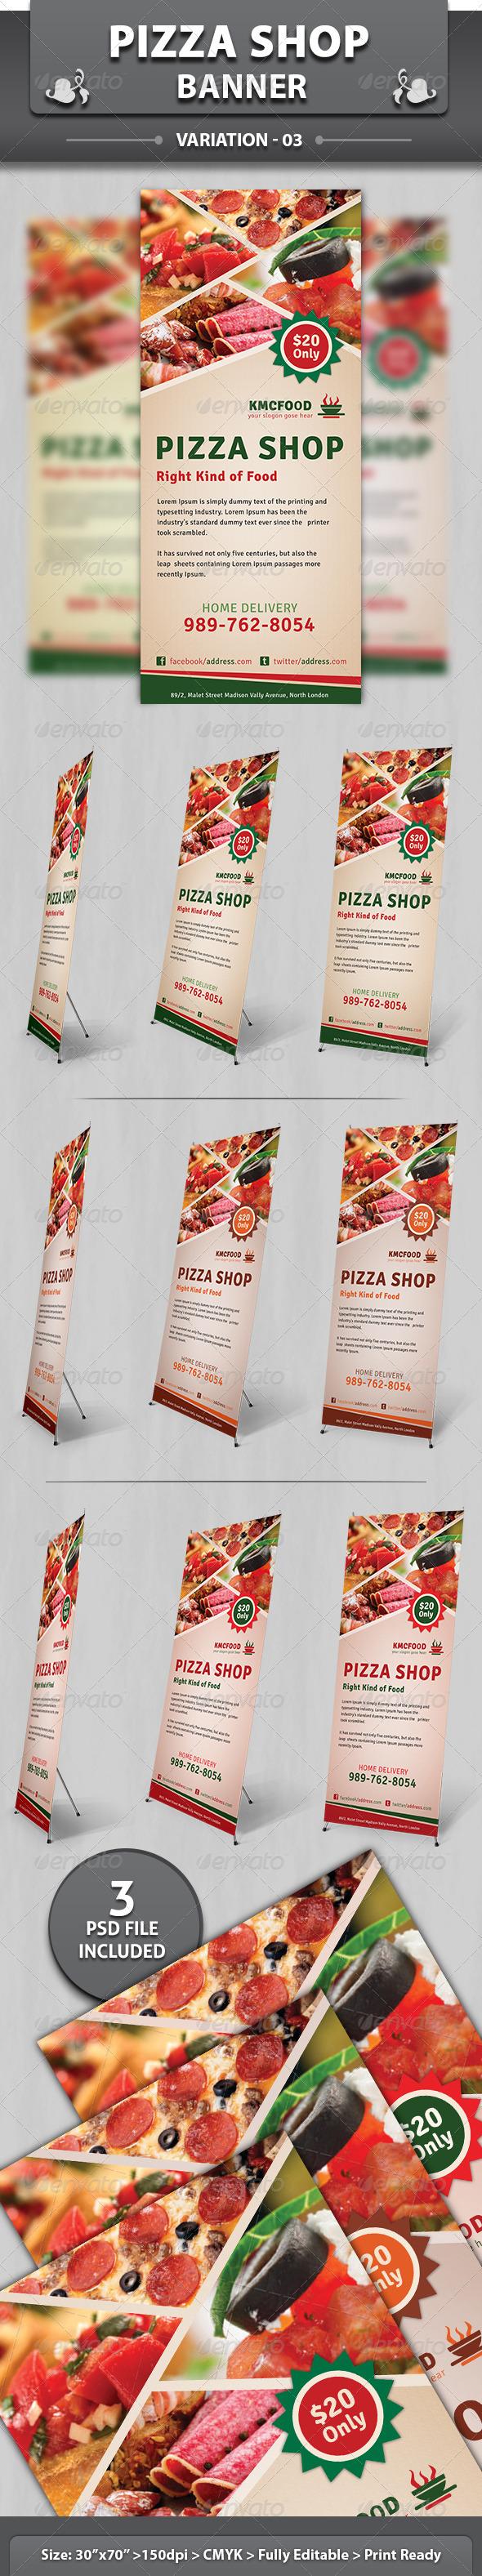 Restaurant Business Banner | Volume 2 - Signage Print Templates